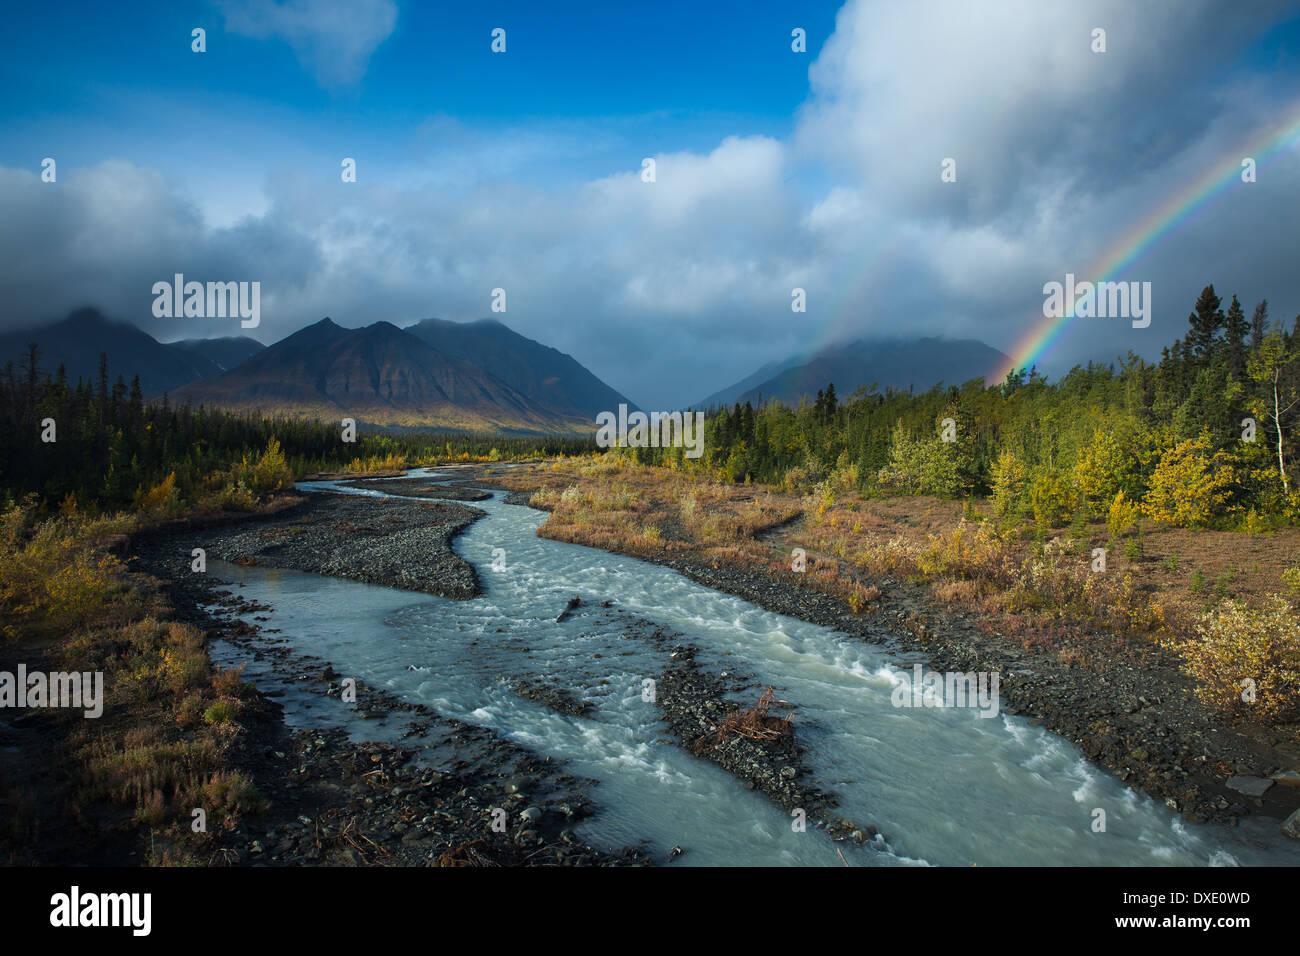 Quill Creek & the Auriol Range, St Elias Mountains, Kluane National Park, Yukon Territories, Canada - Stock Image